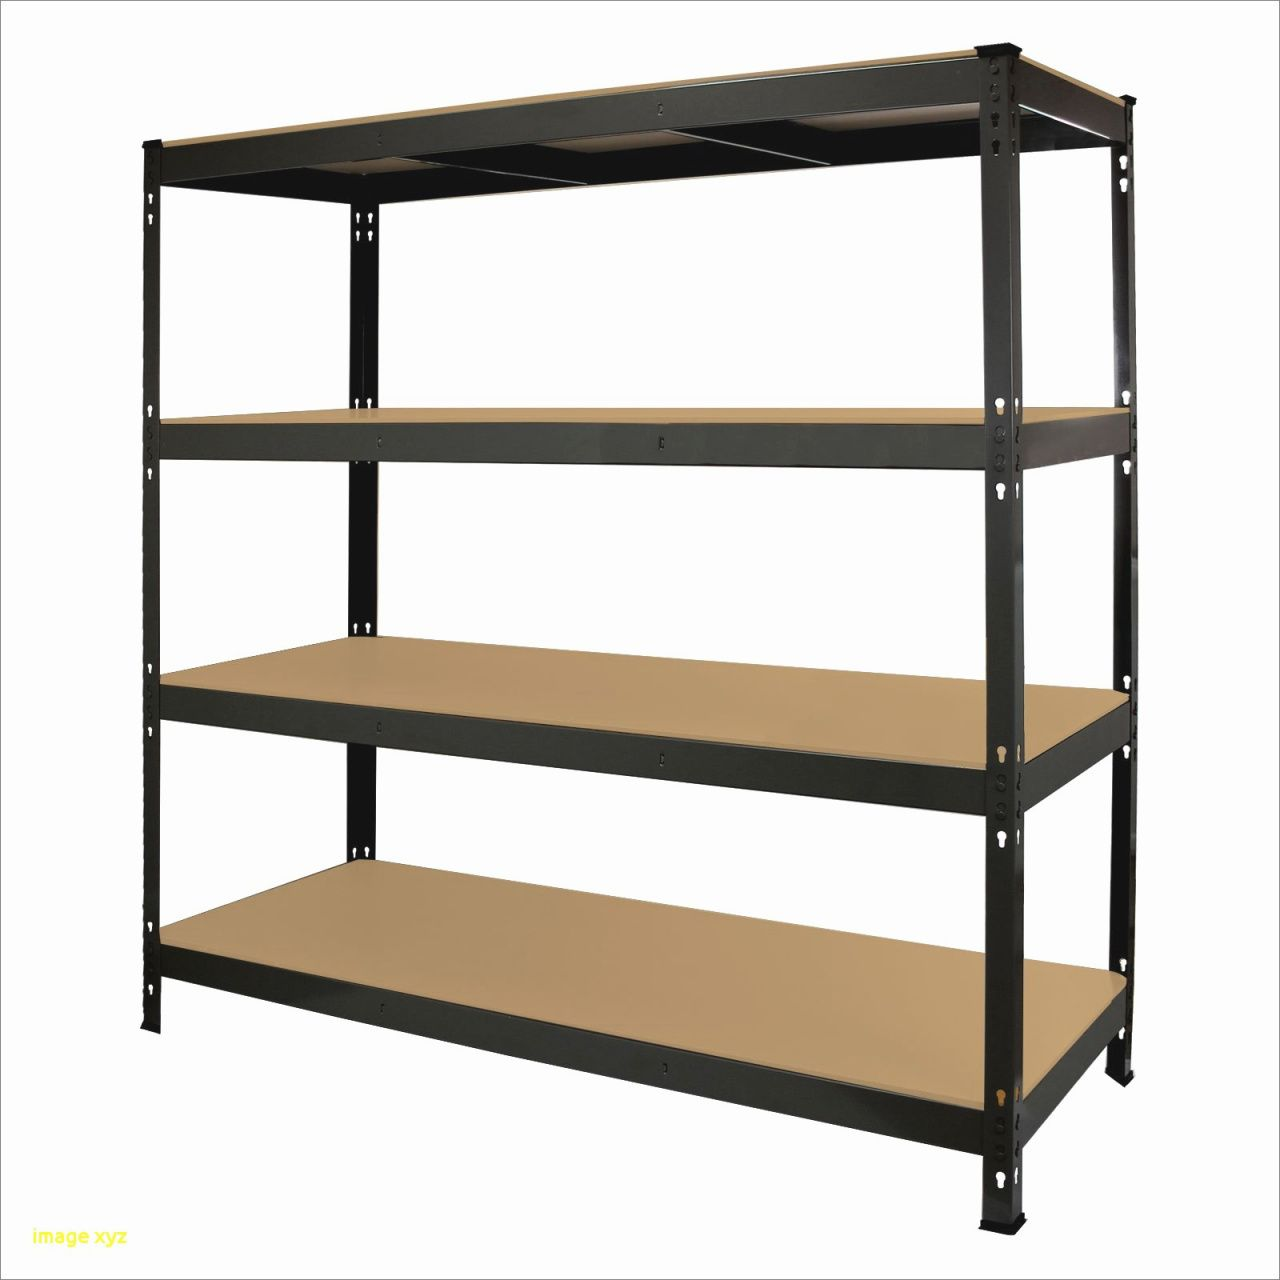 201 Etagere Murale Brico Depot Metal Bookcase Garage Wall Storage Wall Storage Shelves